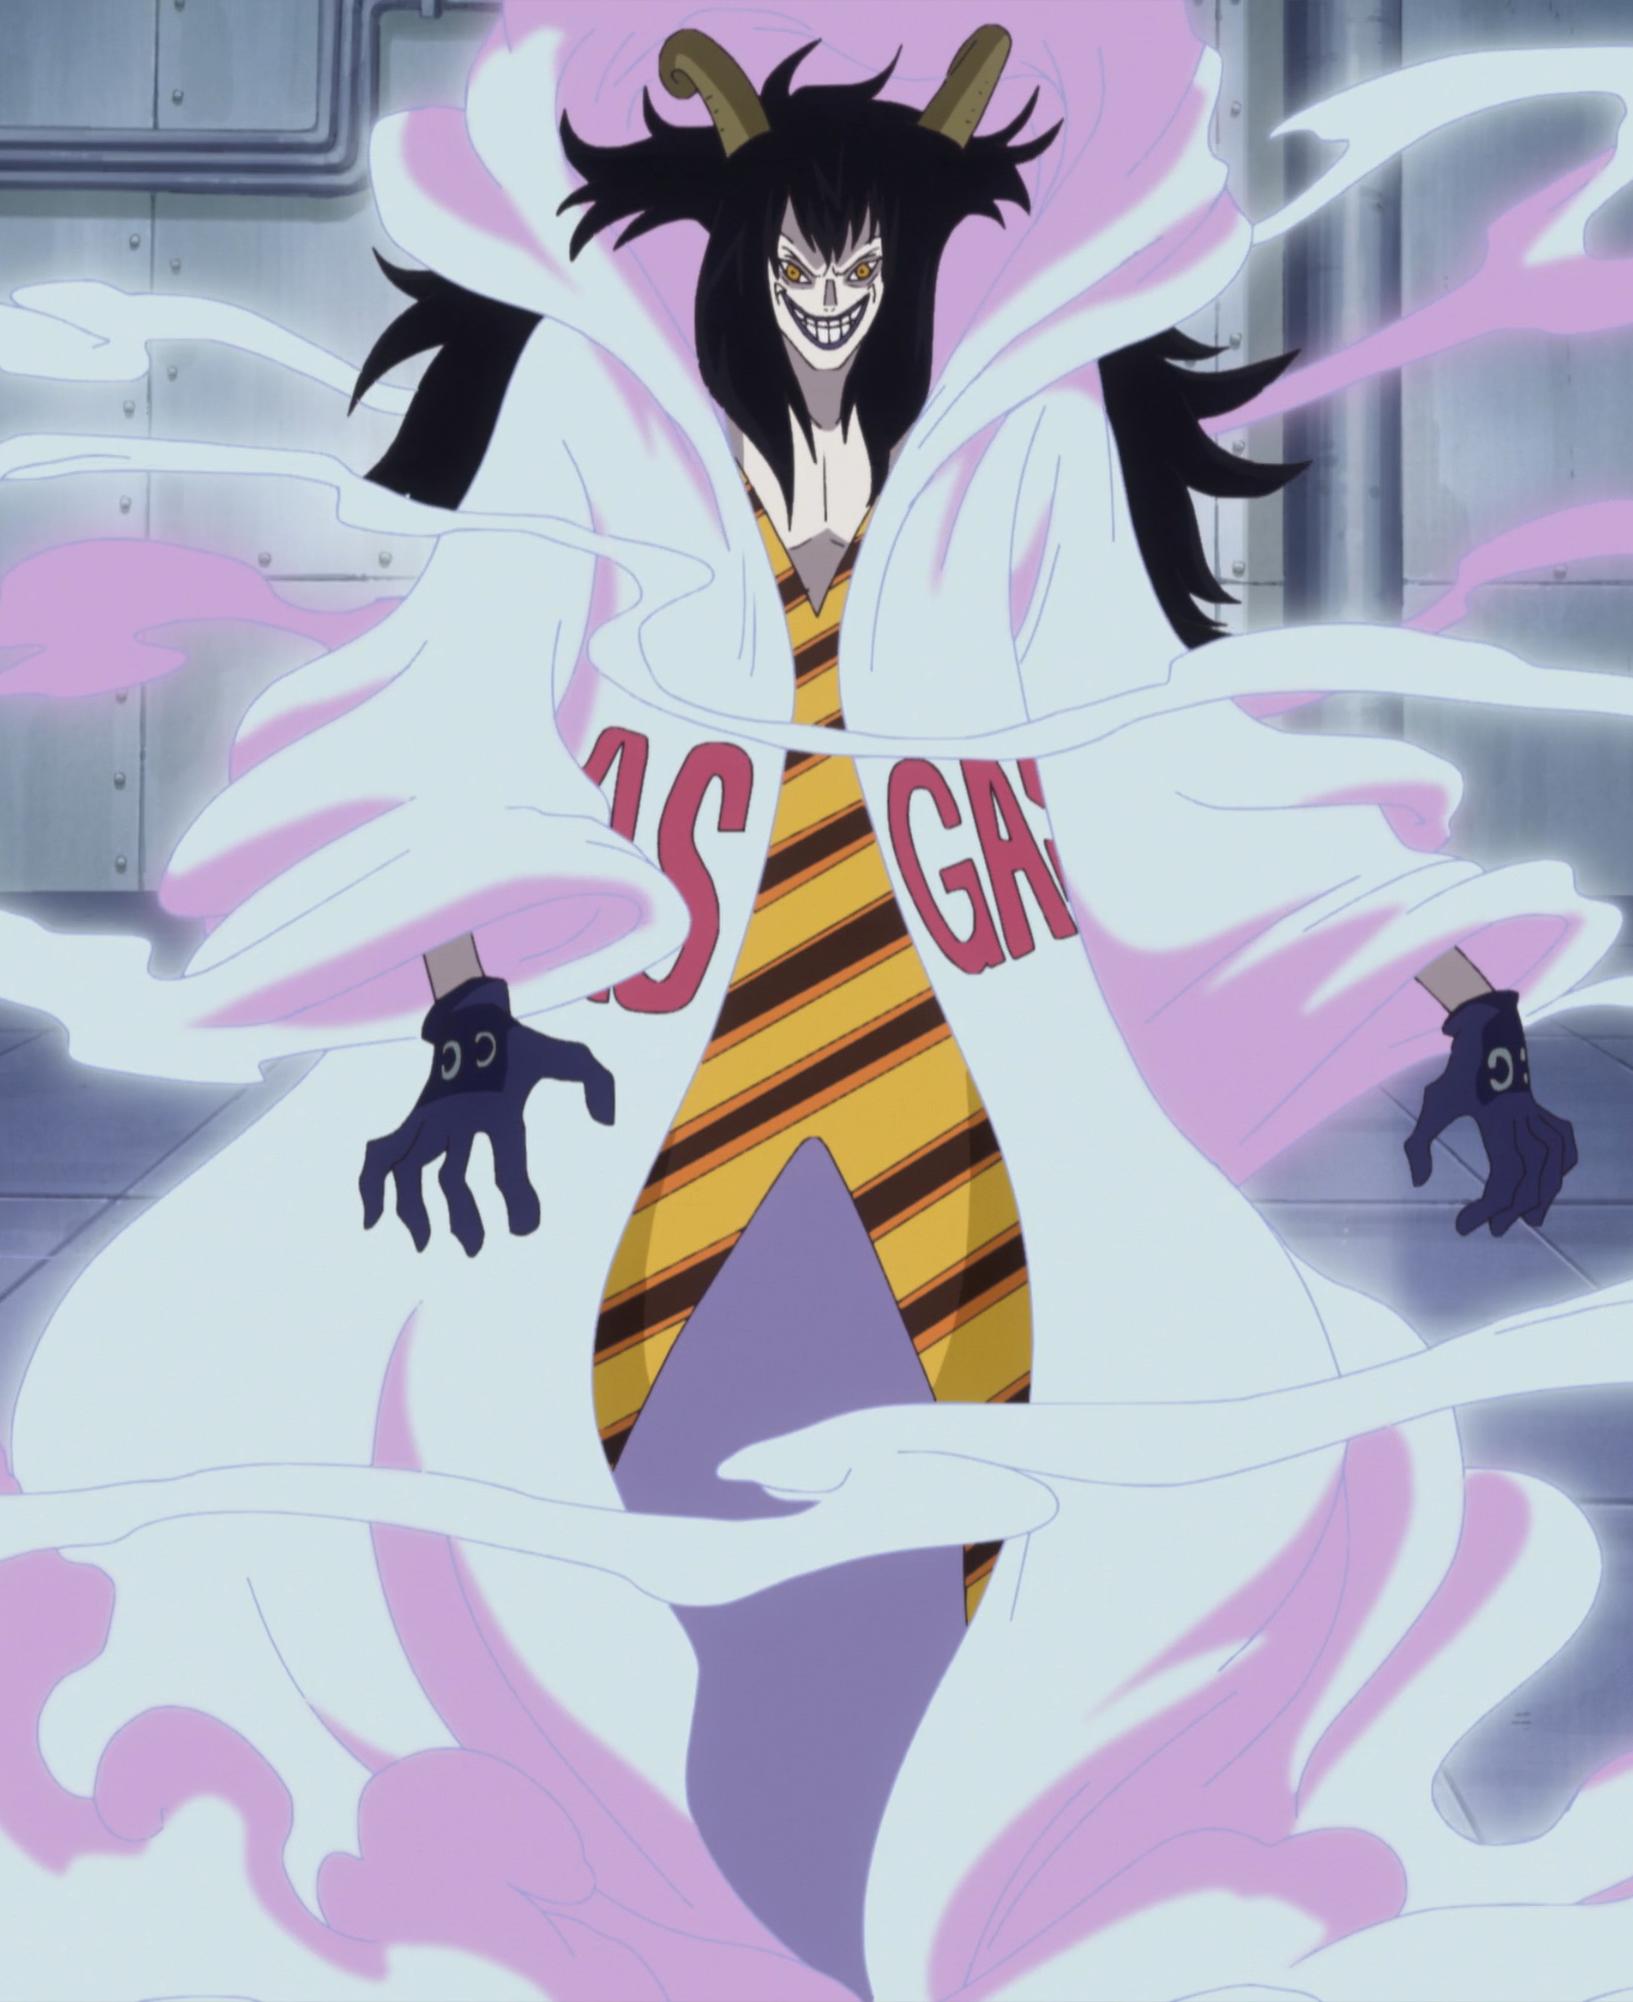 One Piece Encyclopedia: Caesar_Clown_Anime_Infobox.png